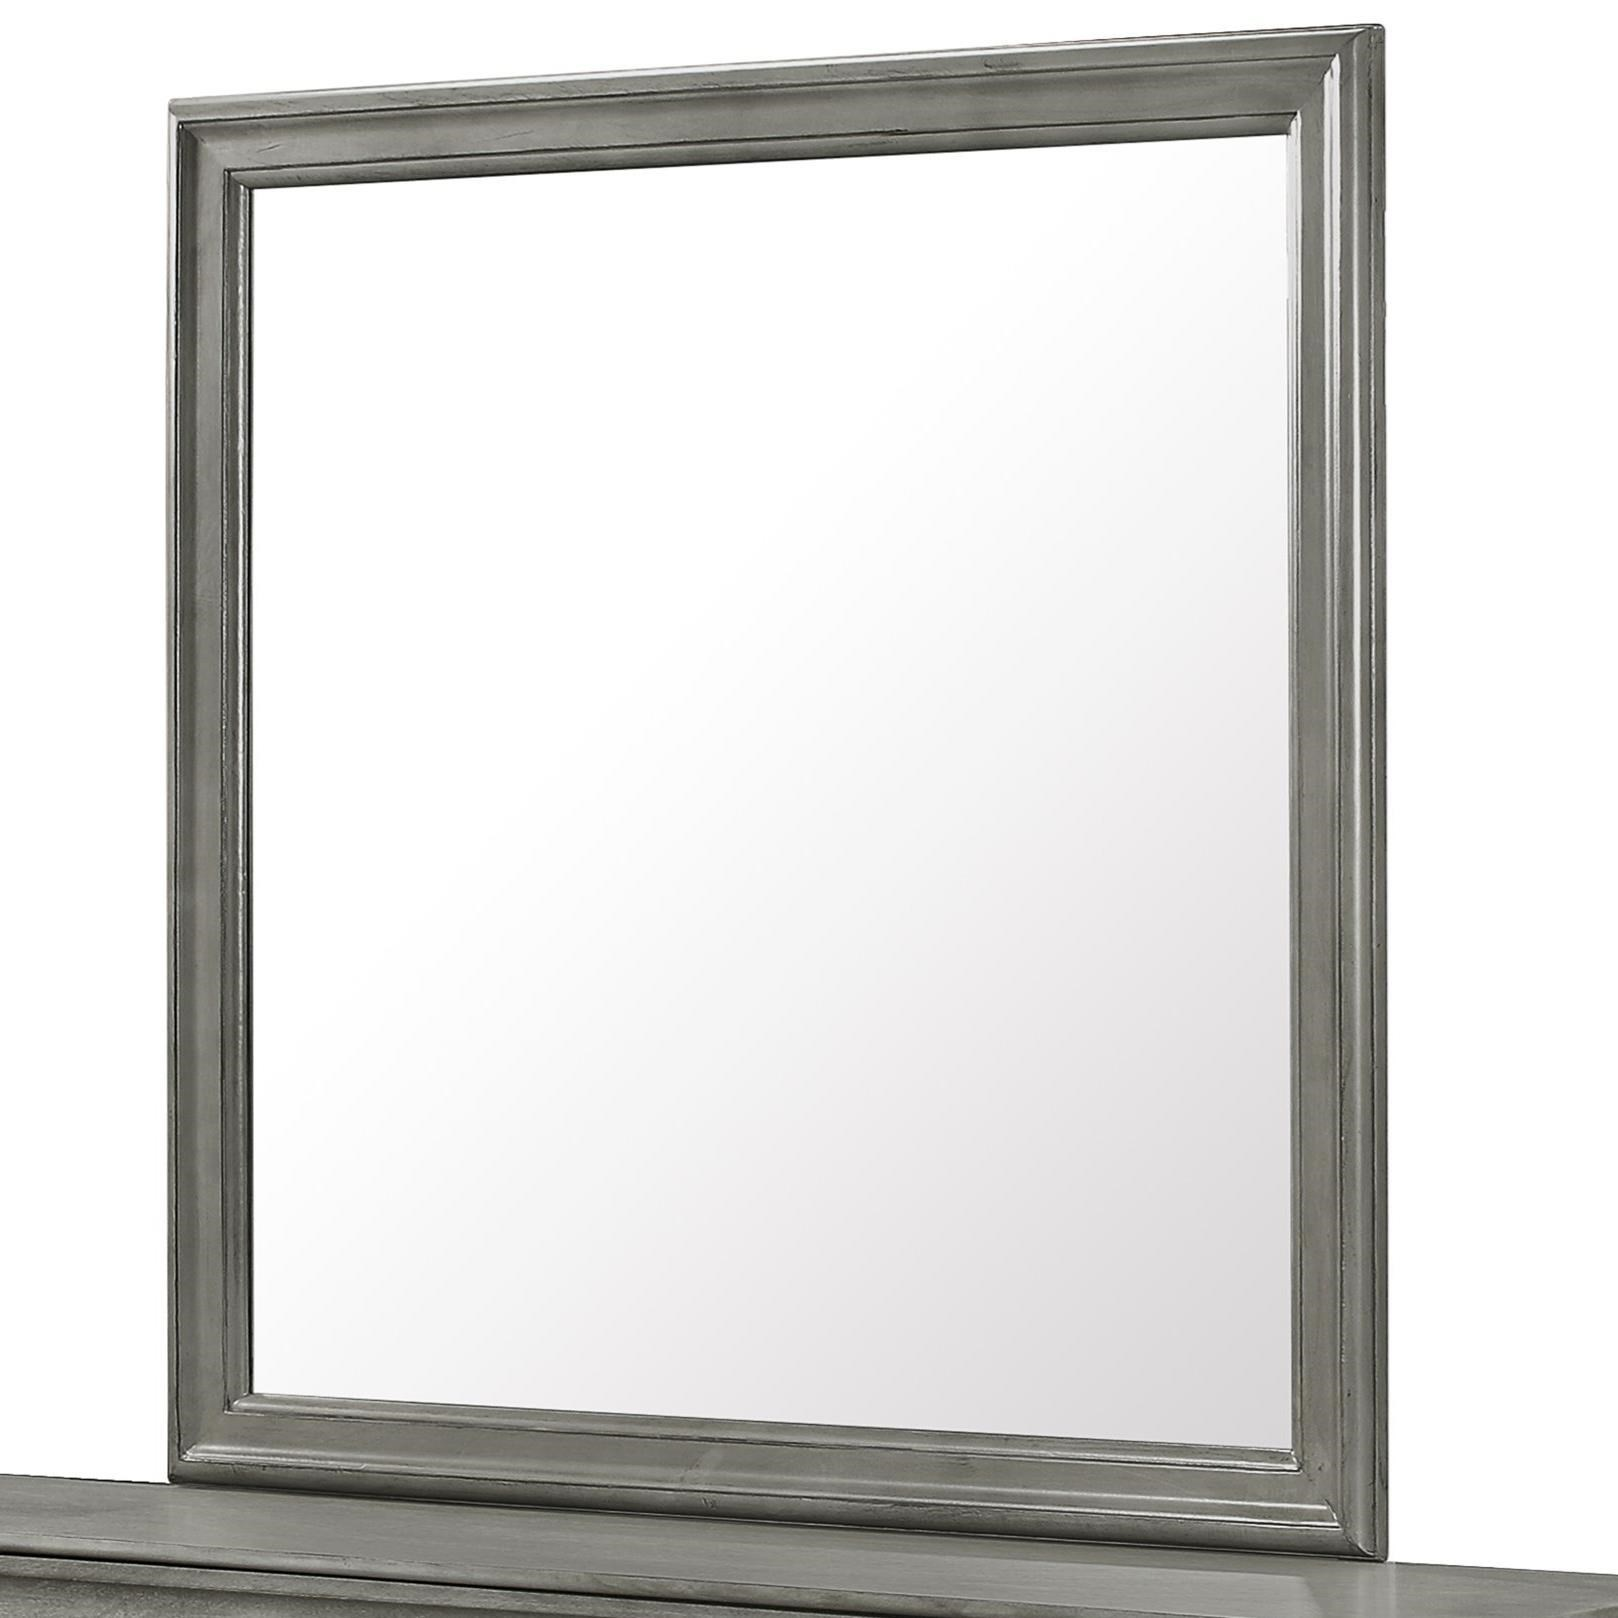 Louis Philip Dresser Mirror by Crown Mark at Northeast Factory Direct